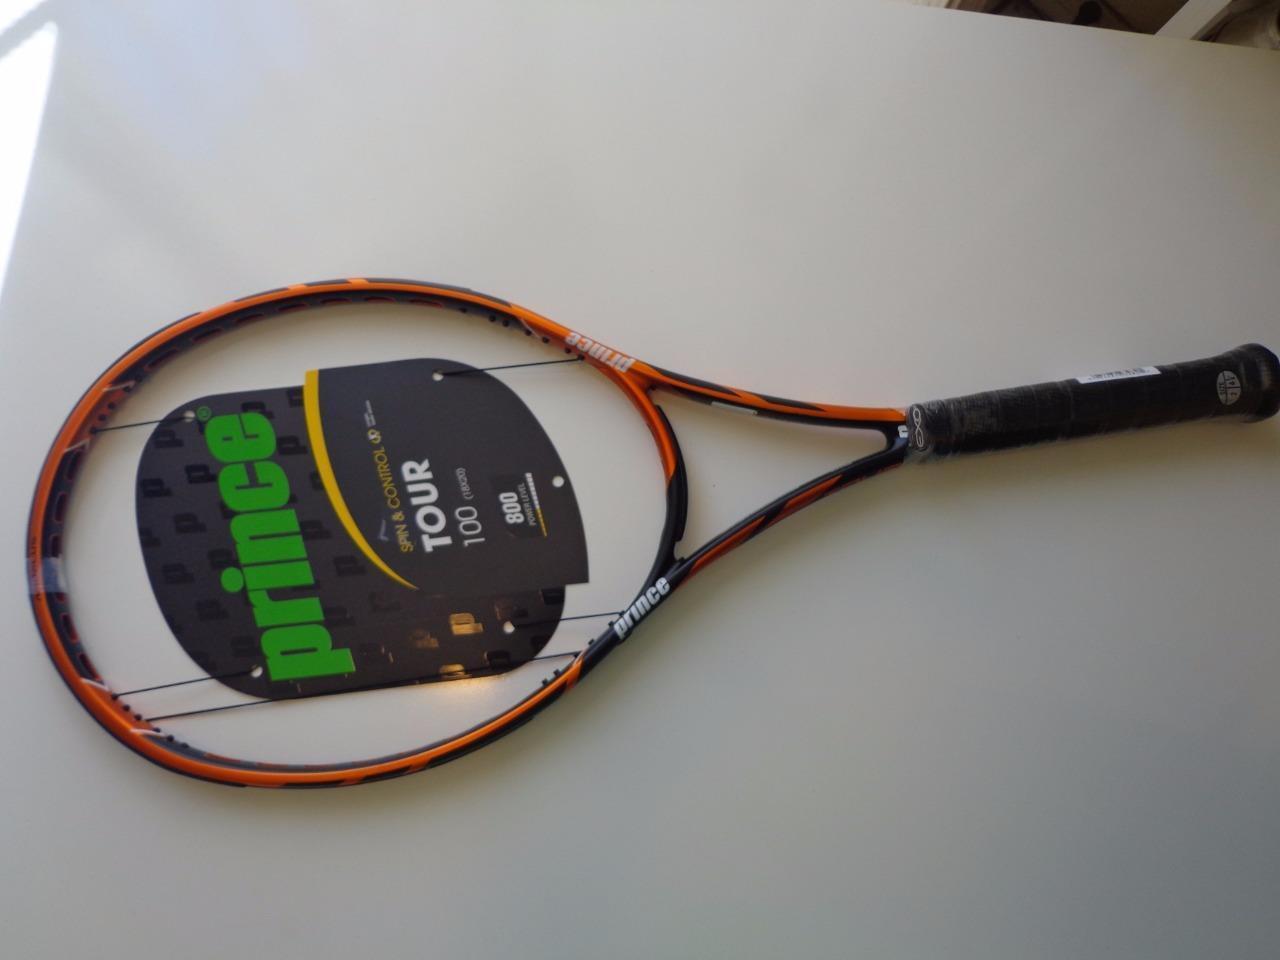 NEW Prince TOUR 100 18x20 4 3 8 grip Tennis Racquet